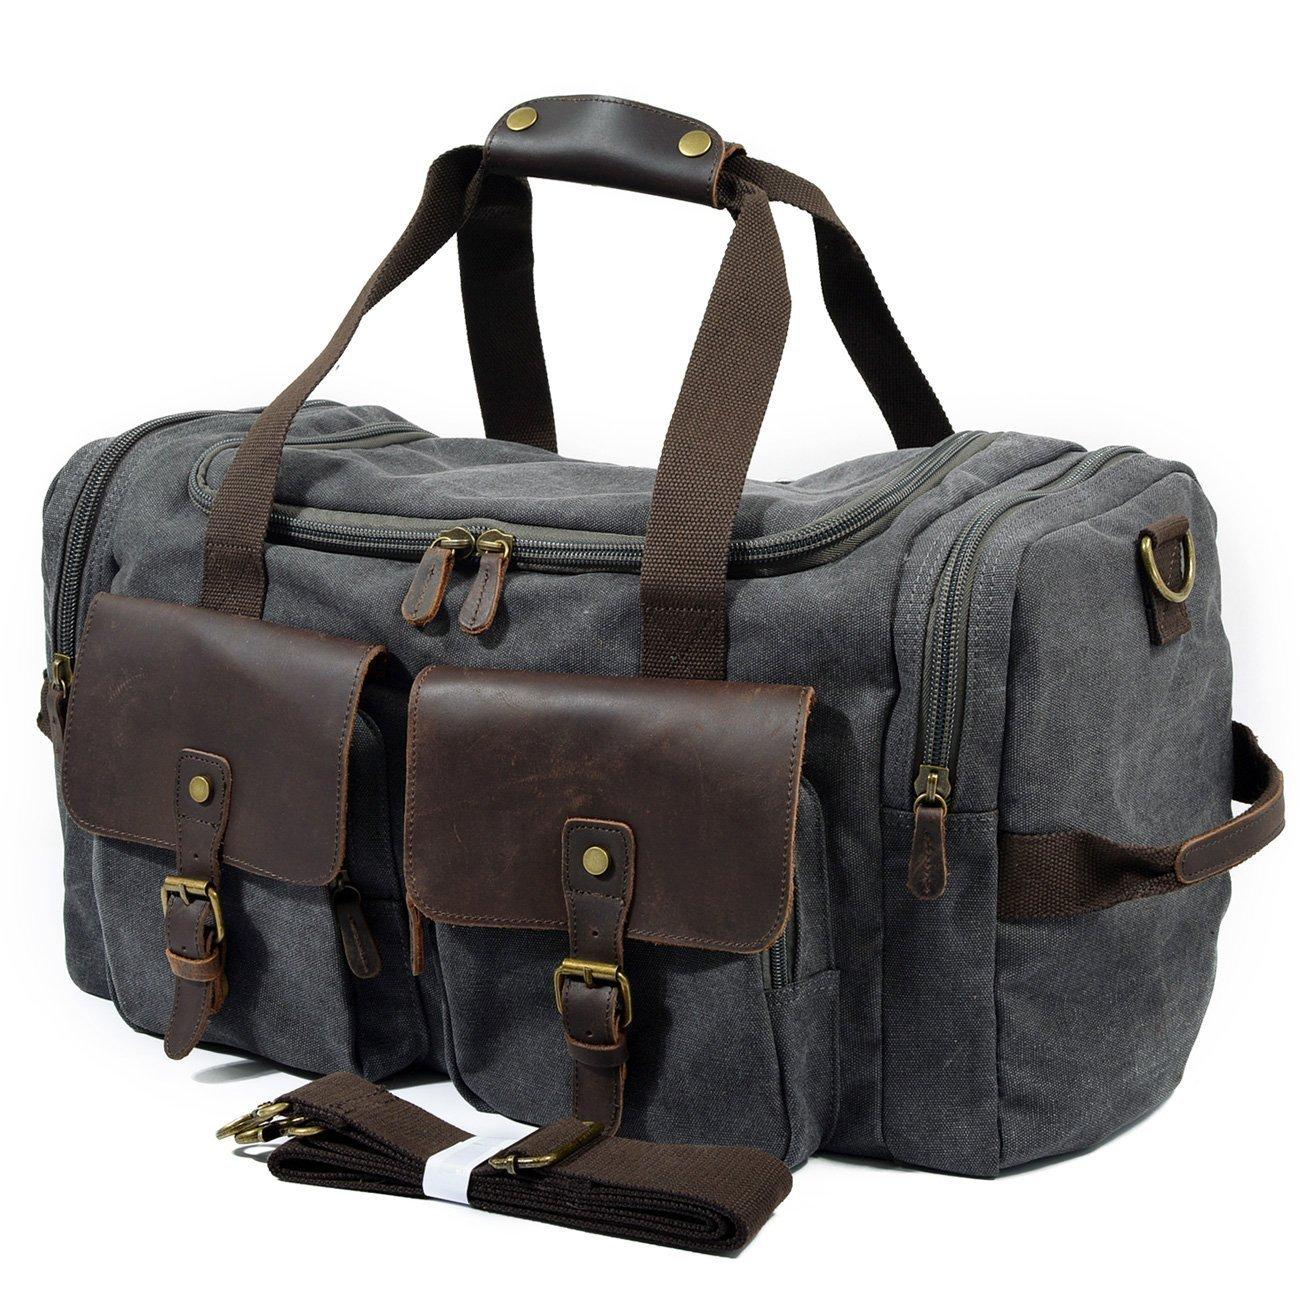 BAIGIO Canvas Weekend Bag Genuine Leather Travel Duffle Bag Vintage Carry On Tote 21'' Luggage (Dark Gray)